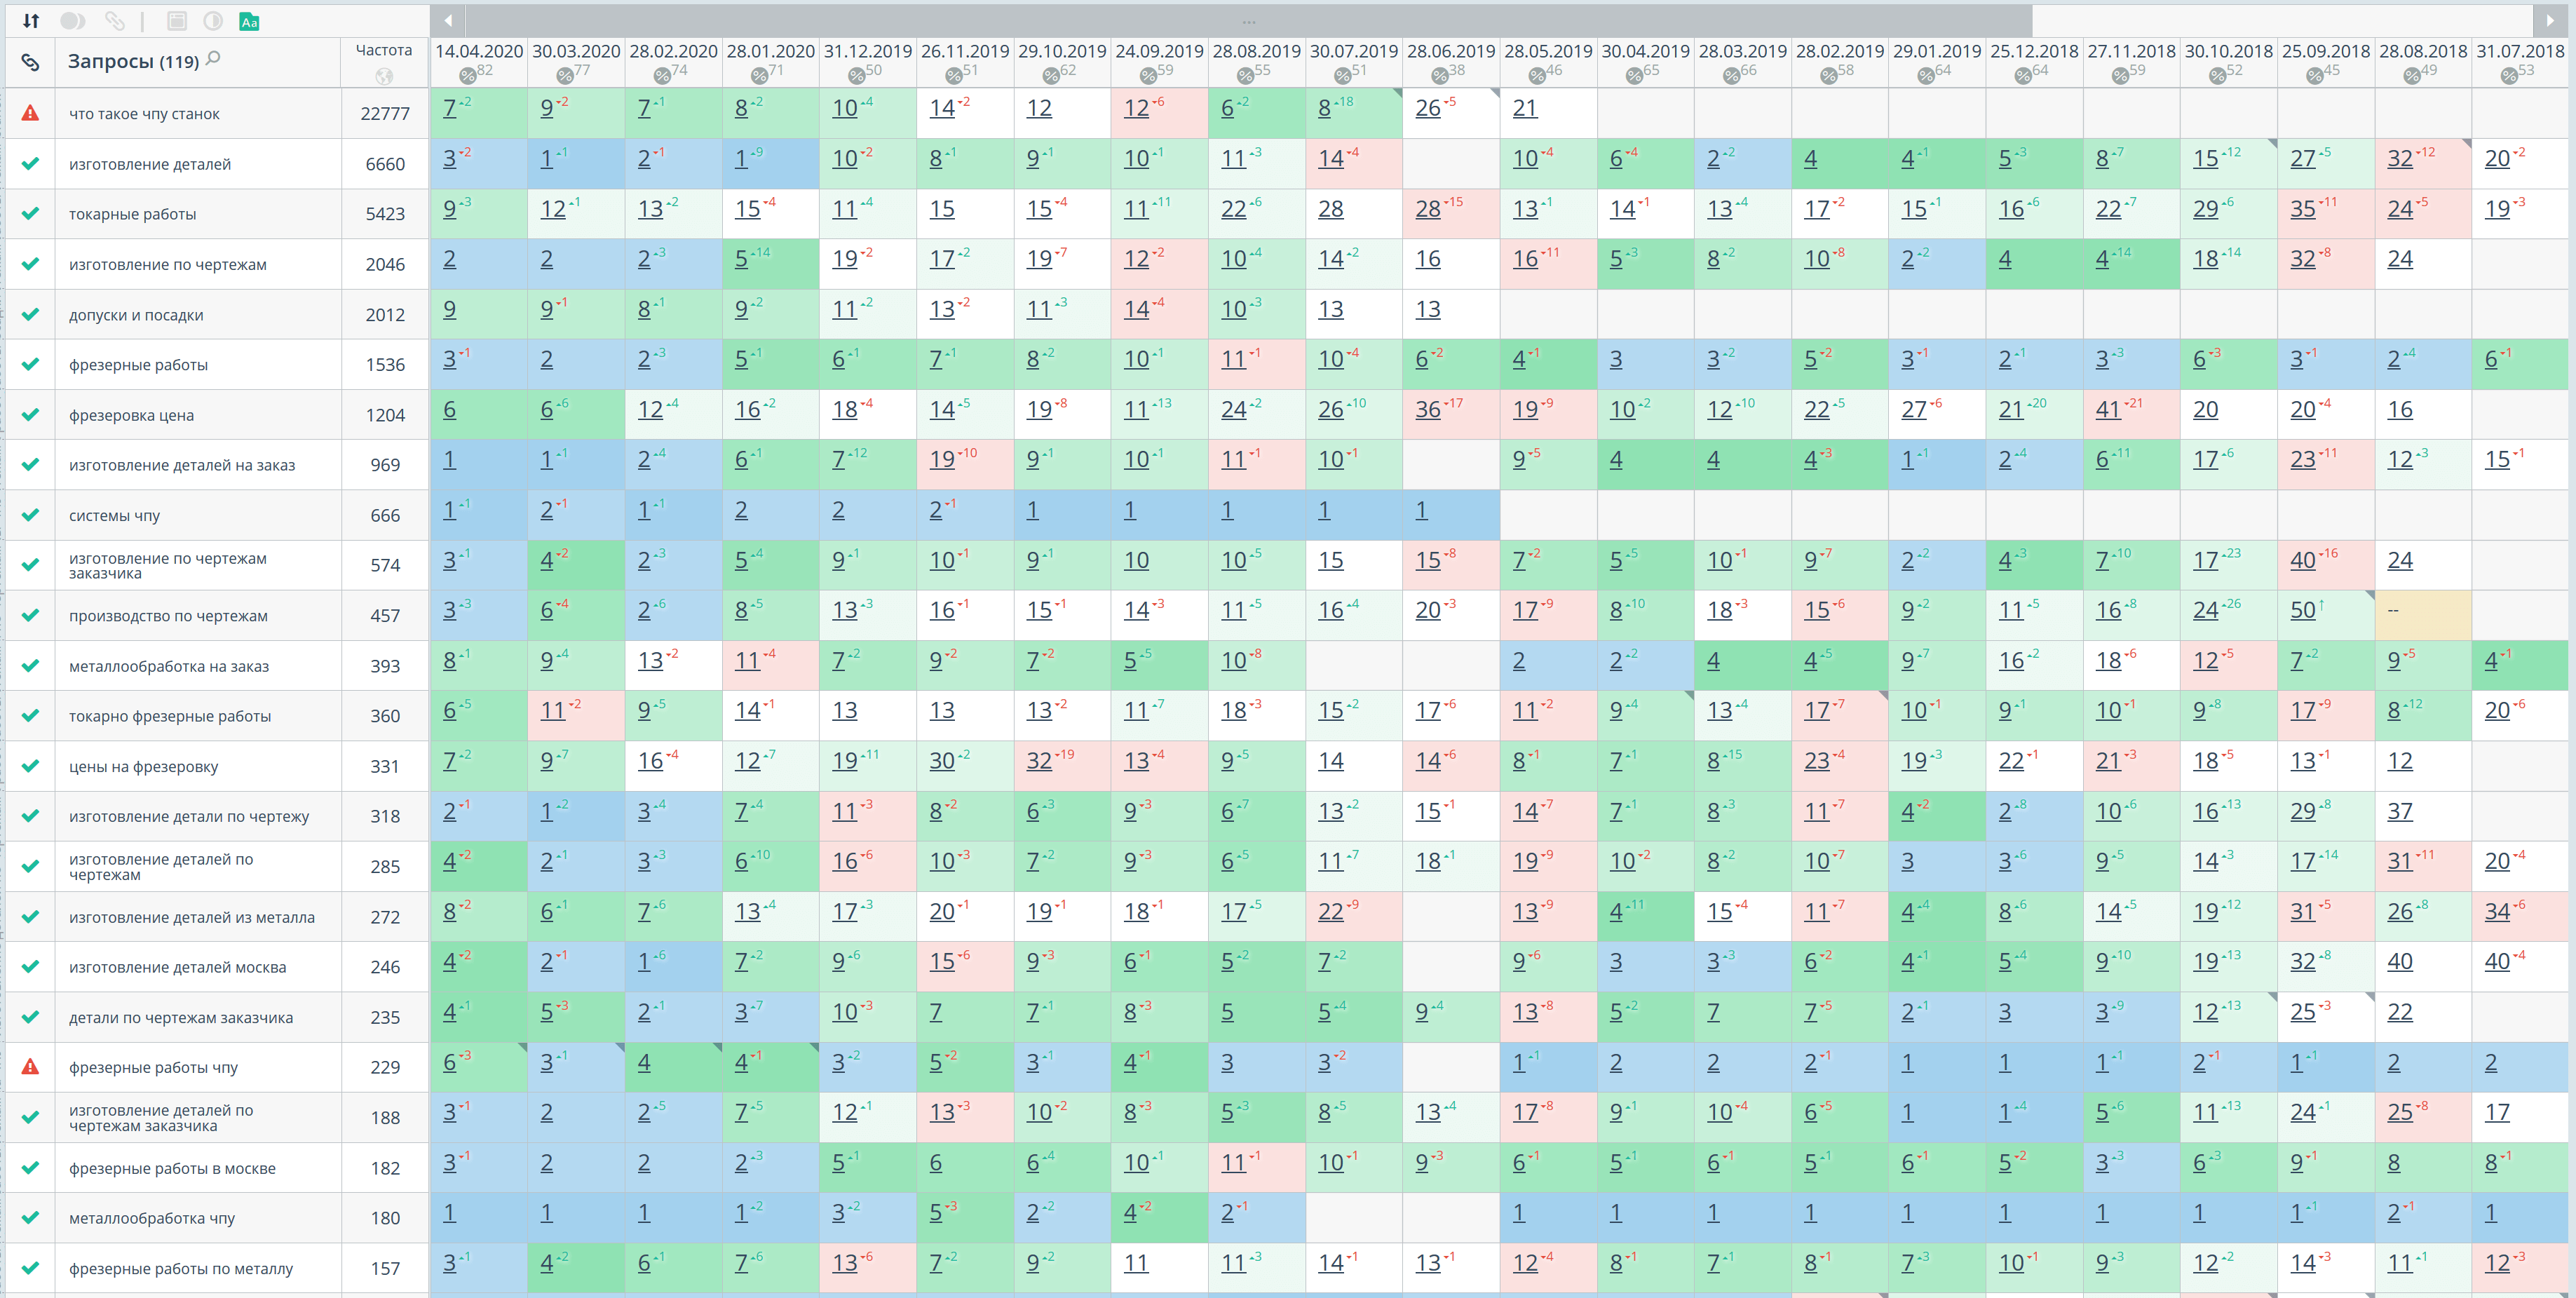 Статистика позиций по Яндексу, регион Москва